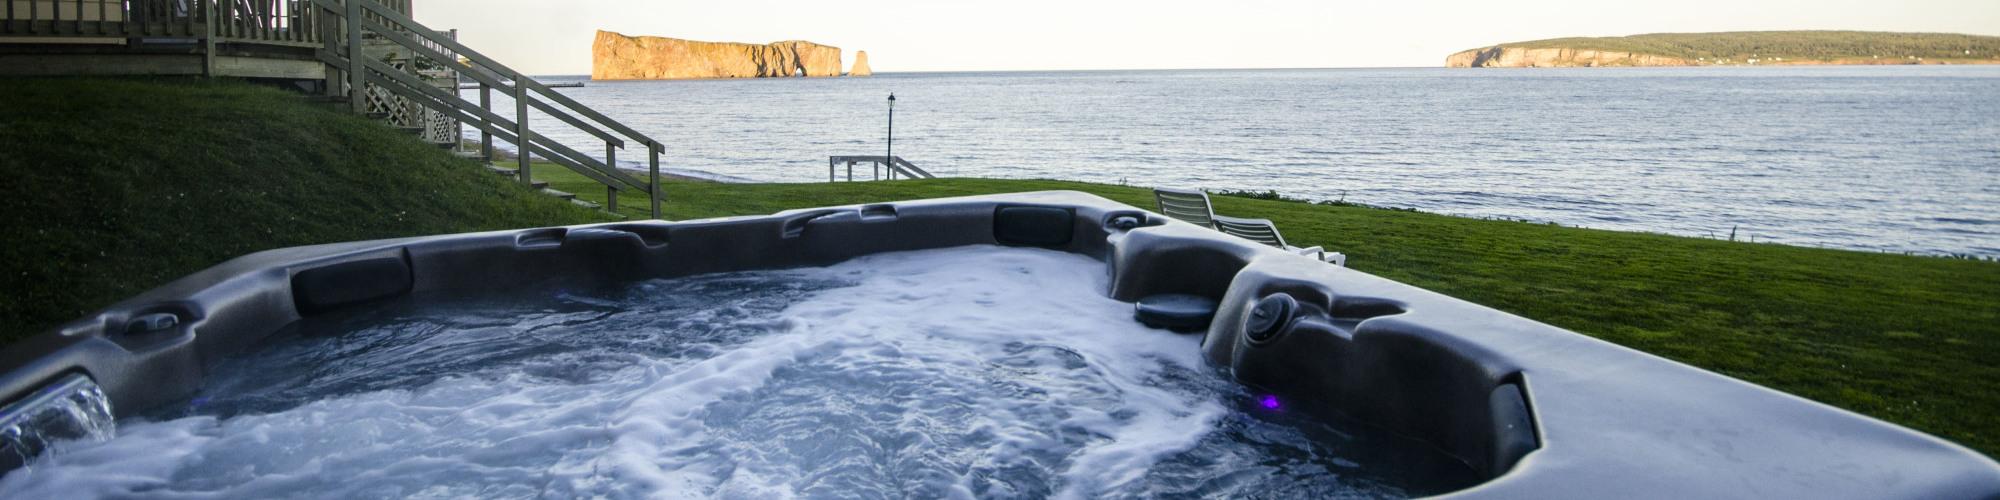 Hot tub, overlooking Percé Rock, Gaspé Peninsula